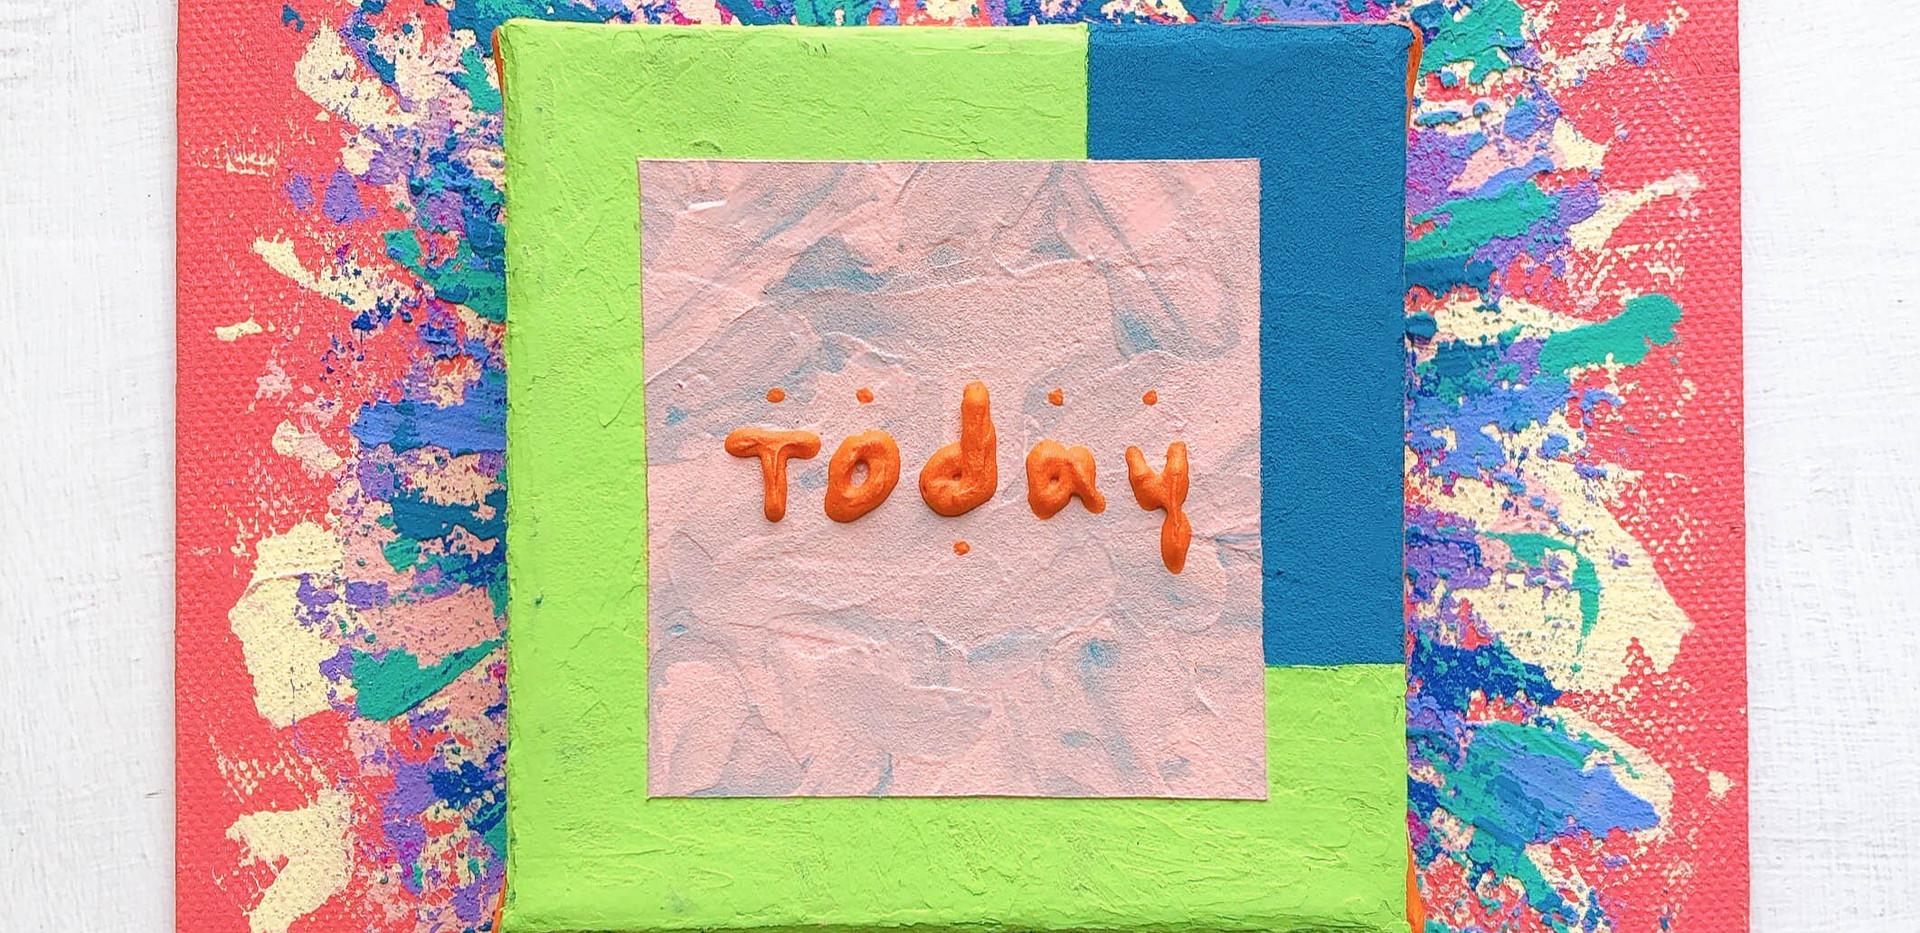 Today6.jpg